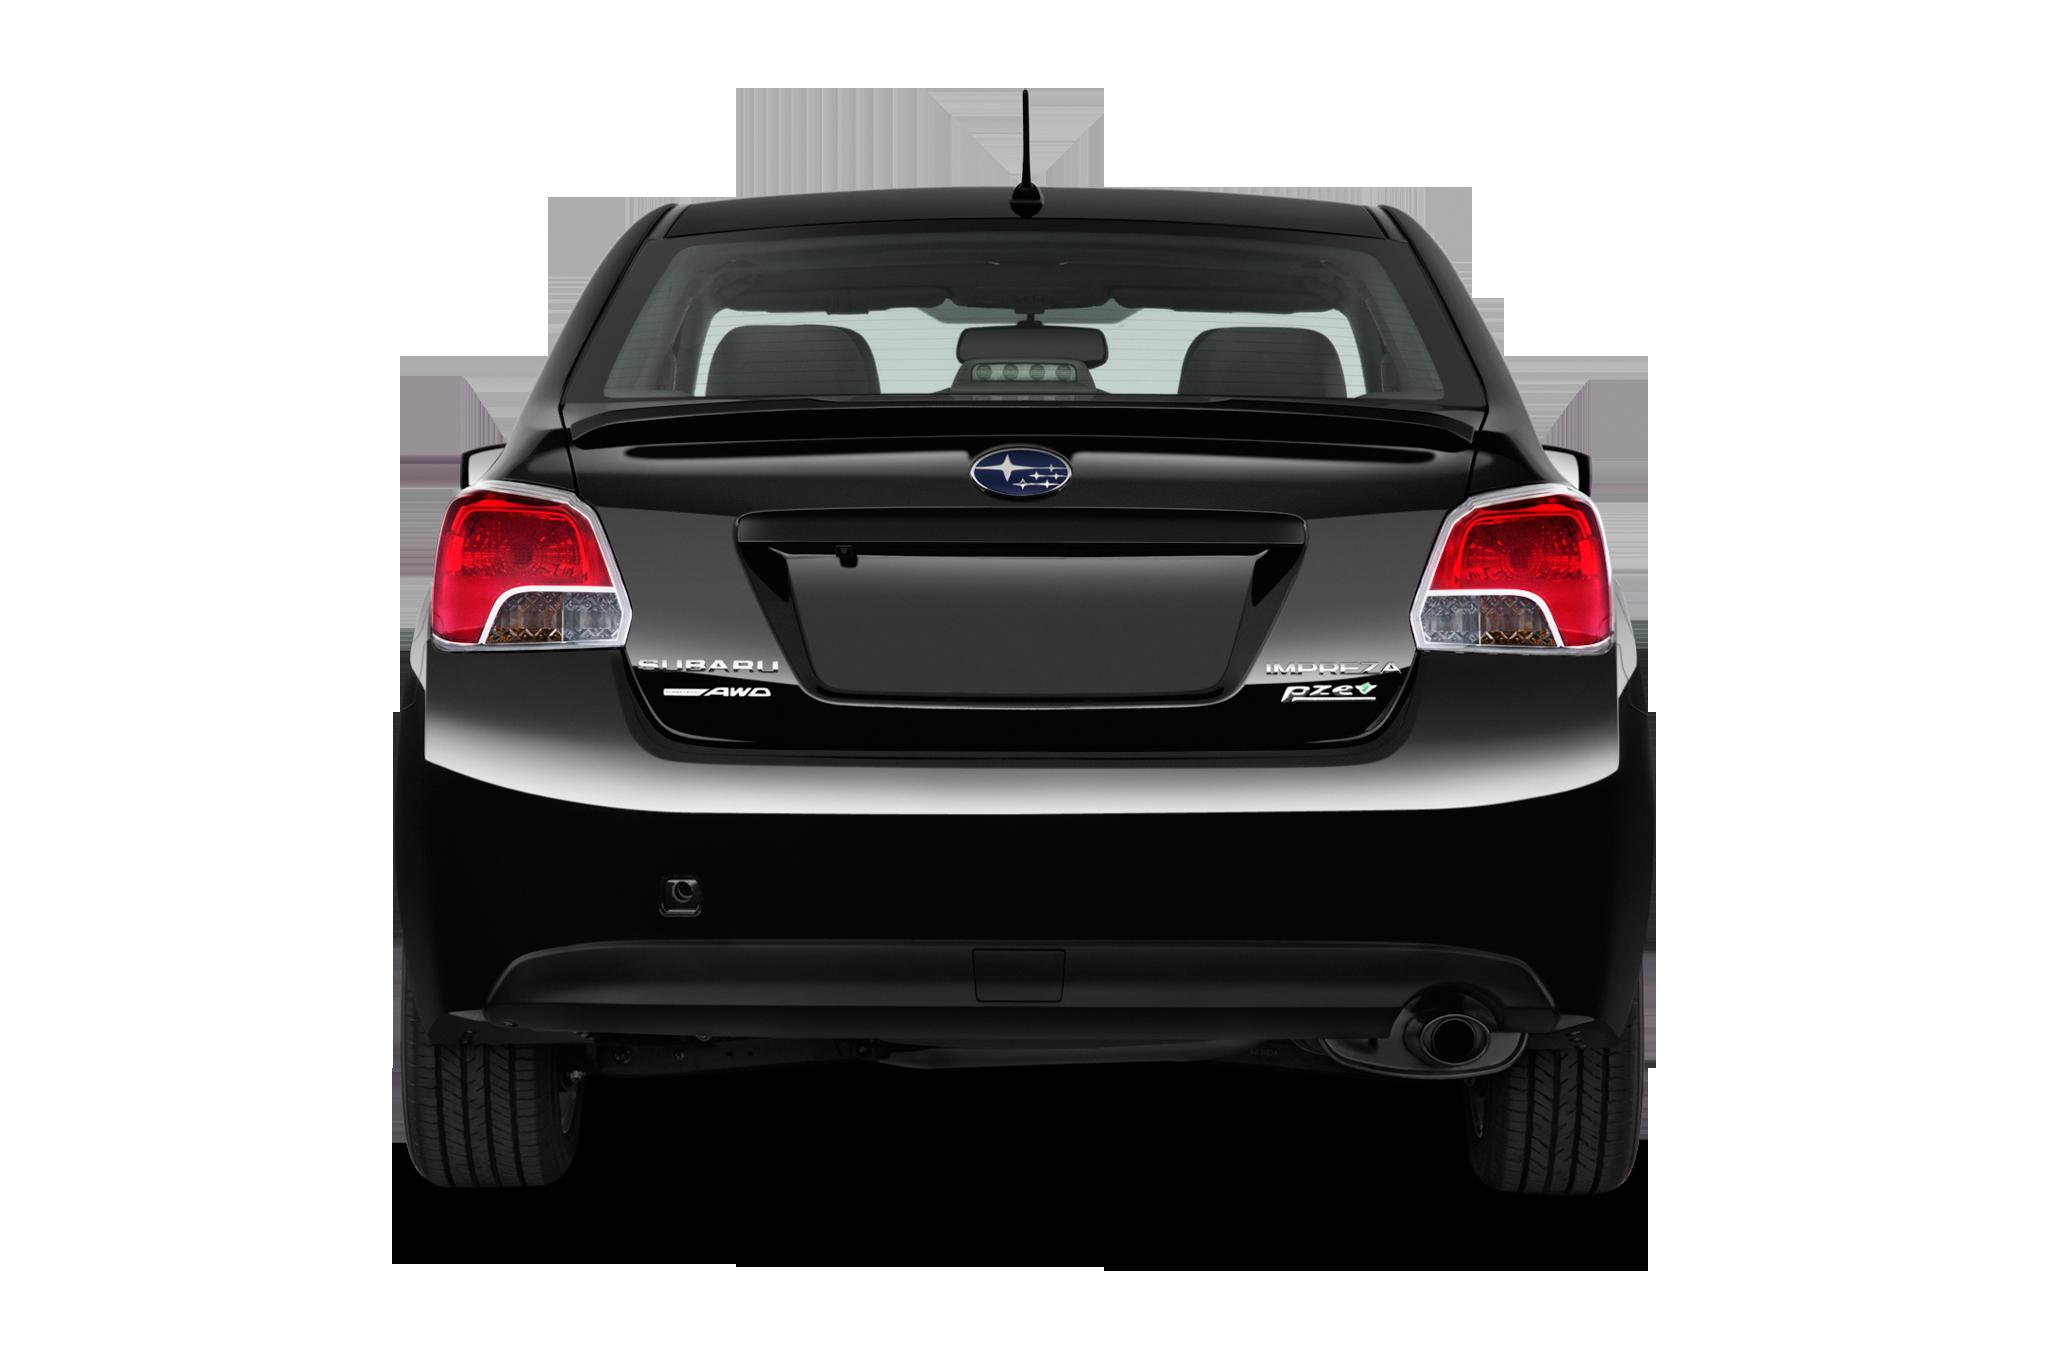 Subaru Impreza 2 0 I Sport Premium Review 2015 Subaru